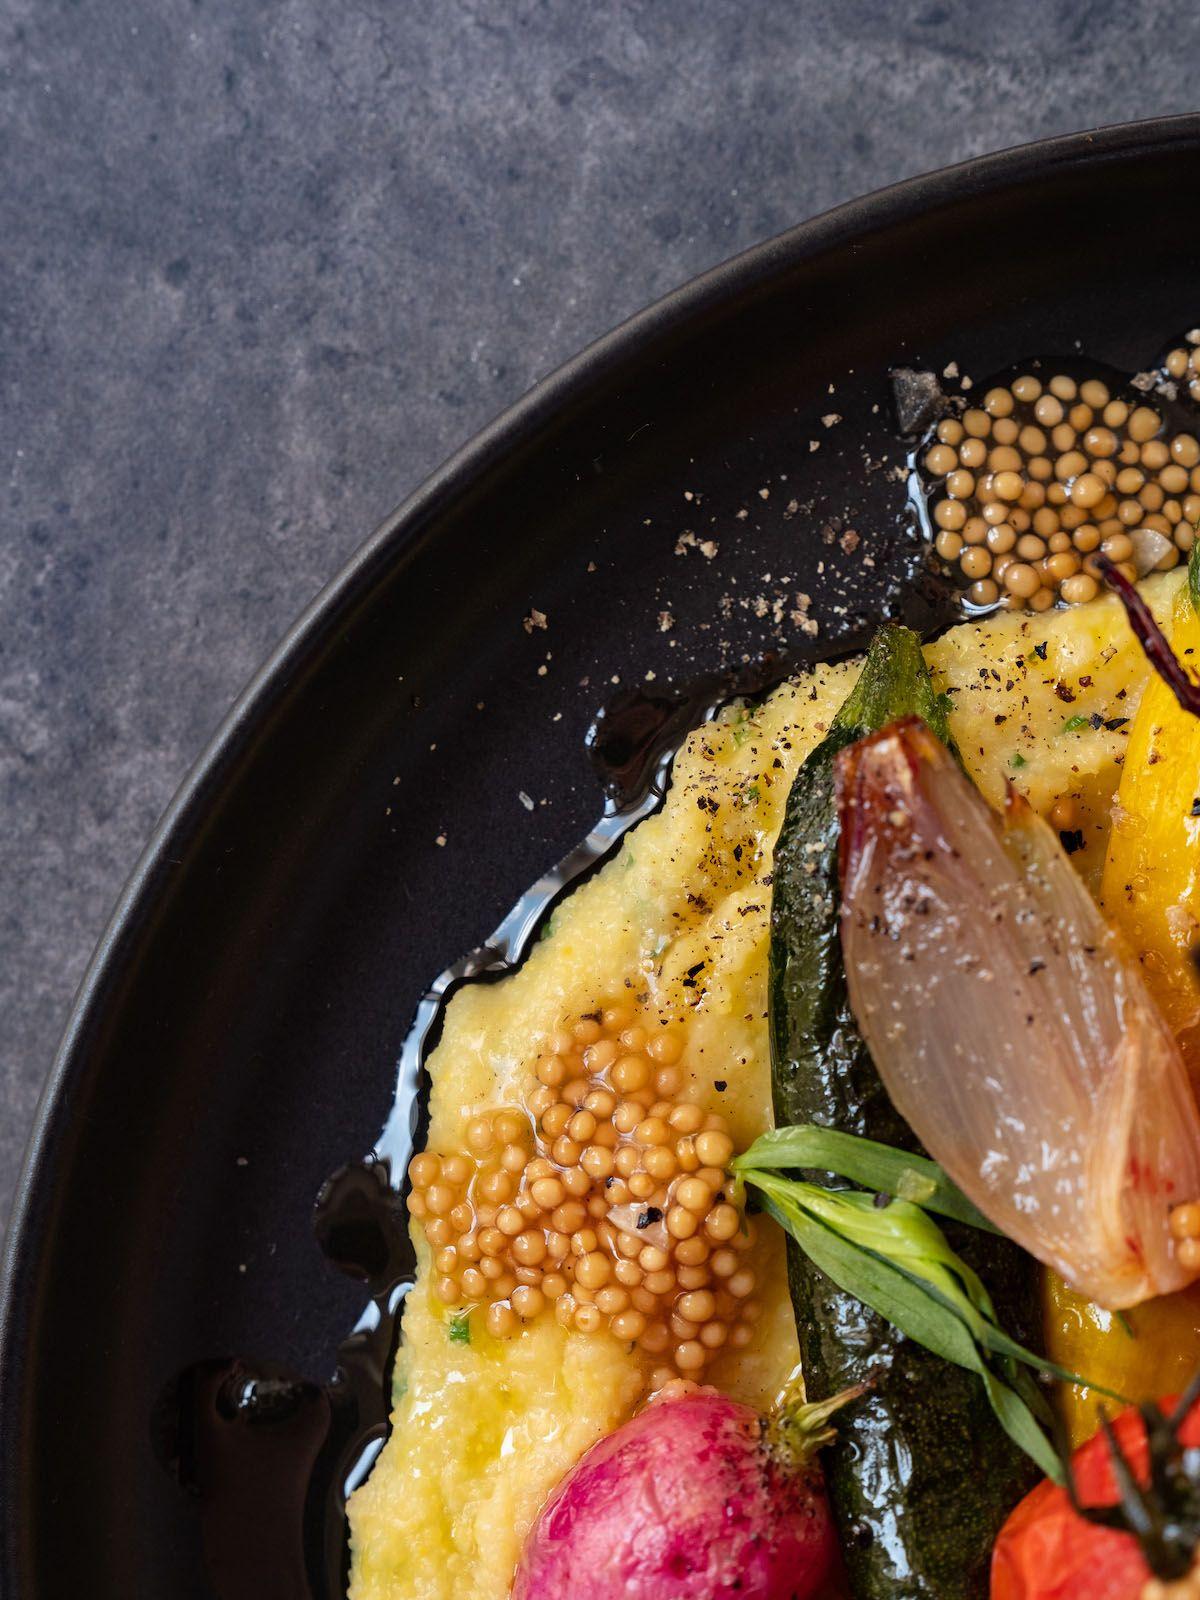 Rezept, Foodblog, Abput Fuel, Senfcaviar, Polenta, Senfsaat, Radieschen